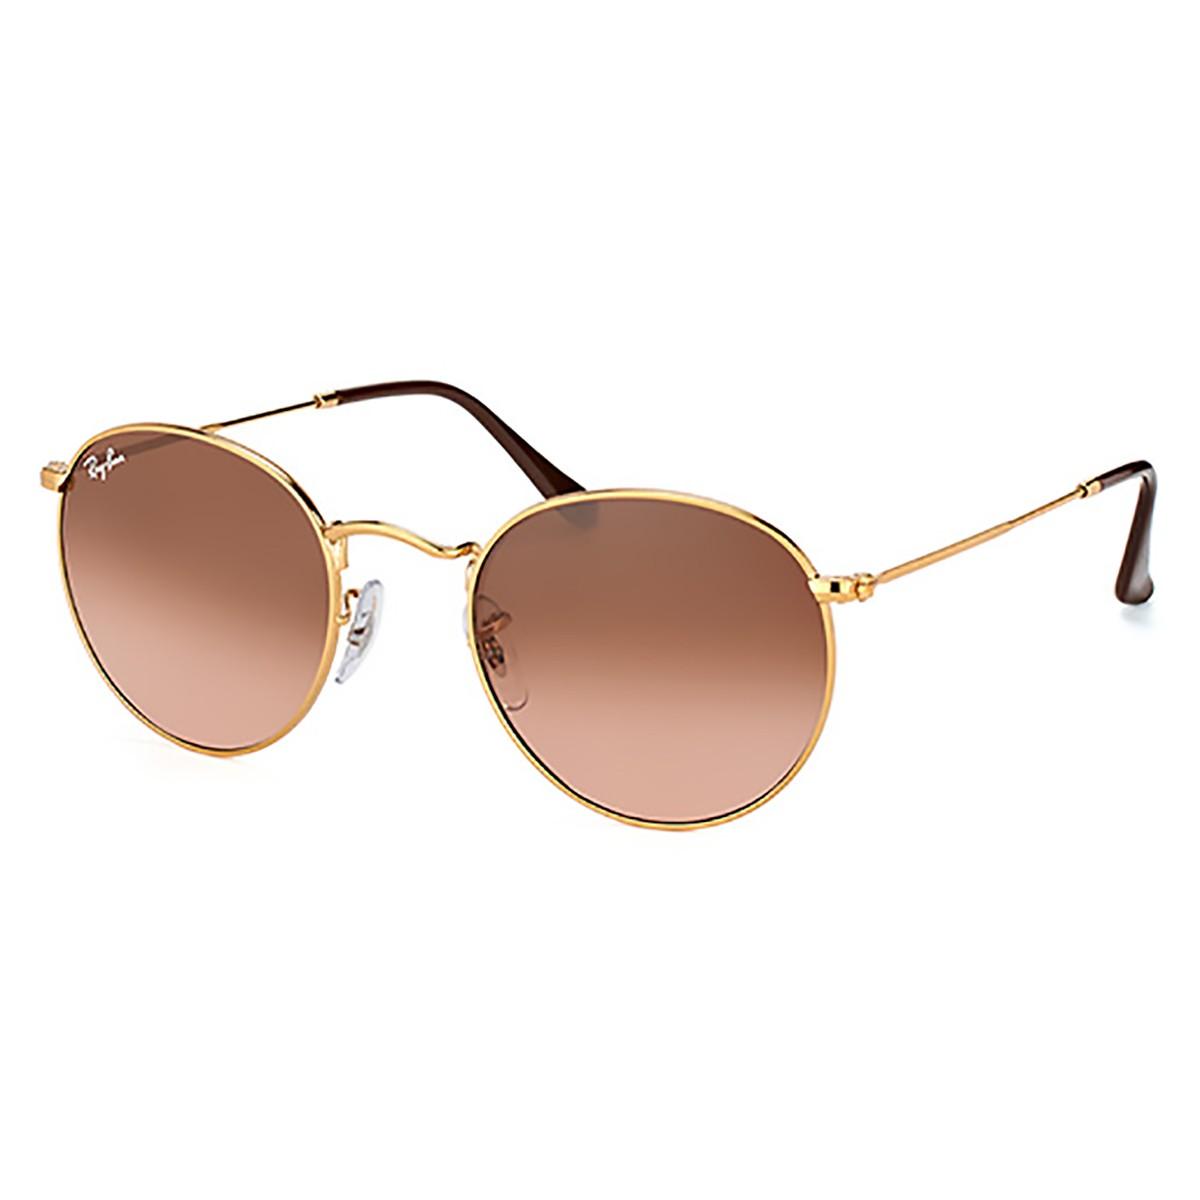 93945b6489568 Compre Óculos de Sol Ray Ban Round Metal em 10X   Tri-Jóia Shop